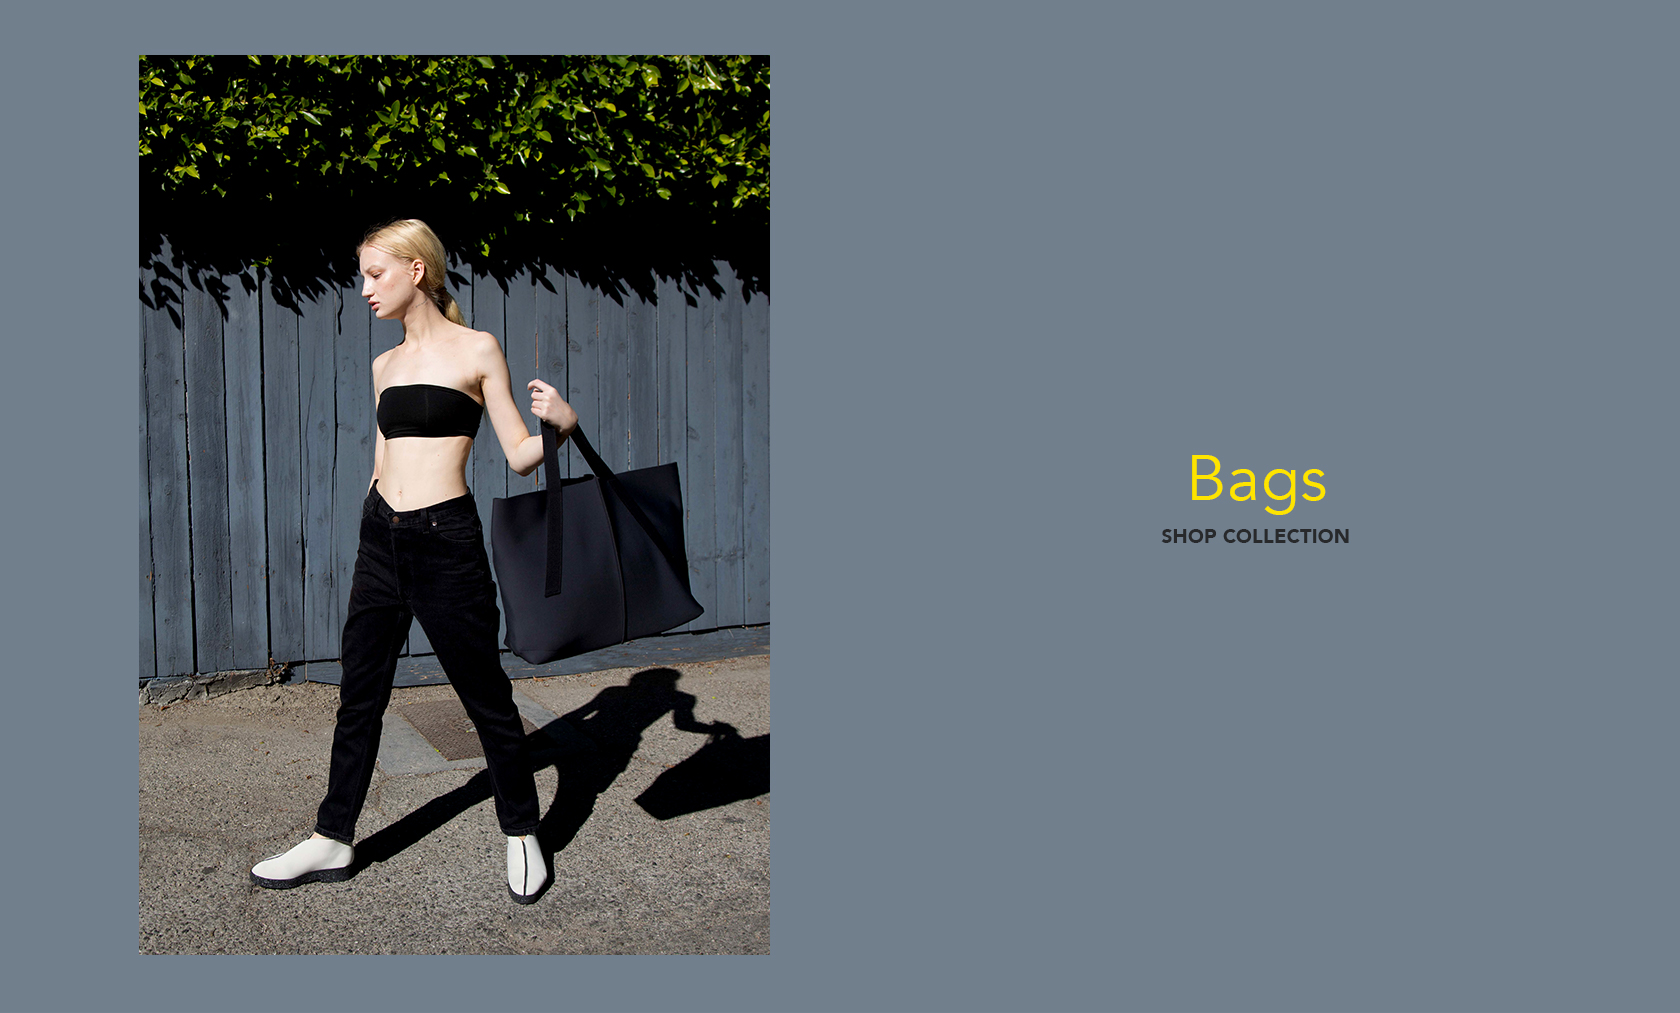 Sunfun_SS18_collection page_bags_sandborn_model